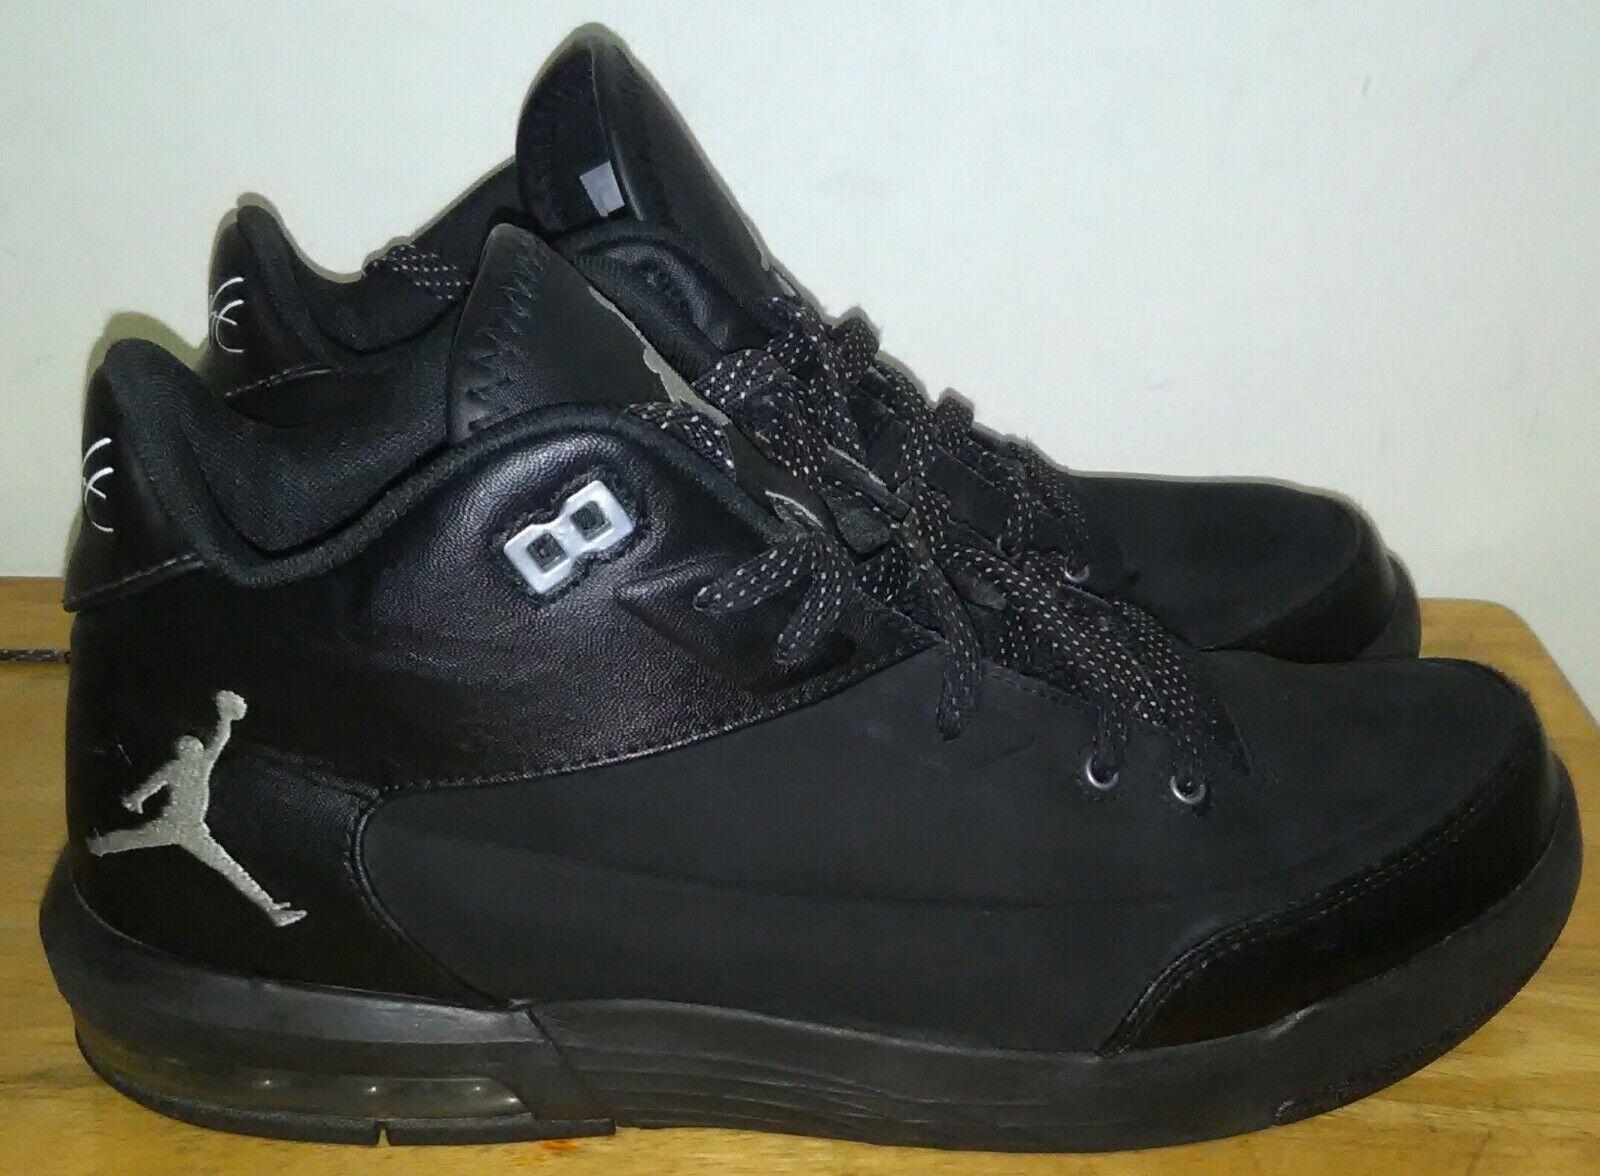 fd64973d Nike Air Jordan Origin 3 Black Metallic Silver Basketball shoes Size 9